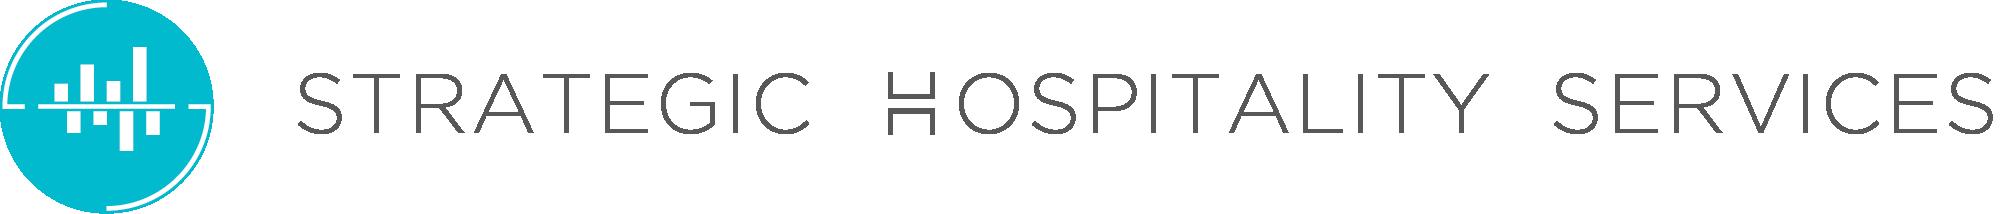 Strategic Hospitality Services